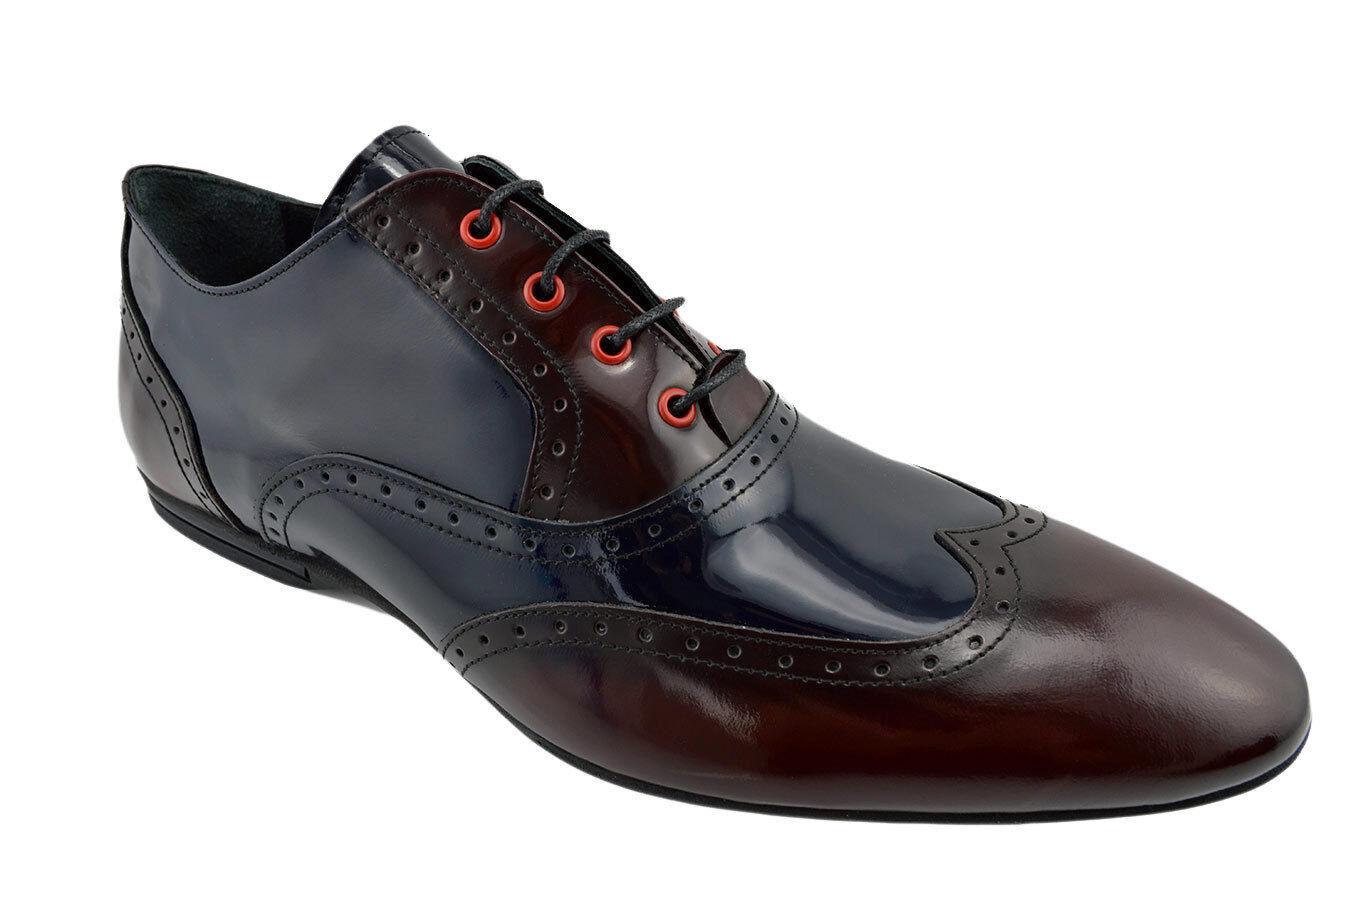 230 NUKTE blu Marroneee Leather WINGTIP Lace Up Oxfords Casual Dress Men scarpe